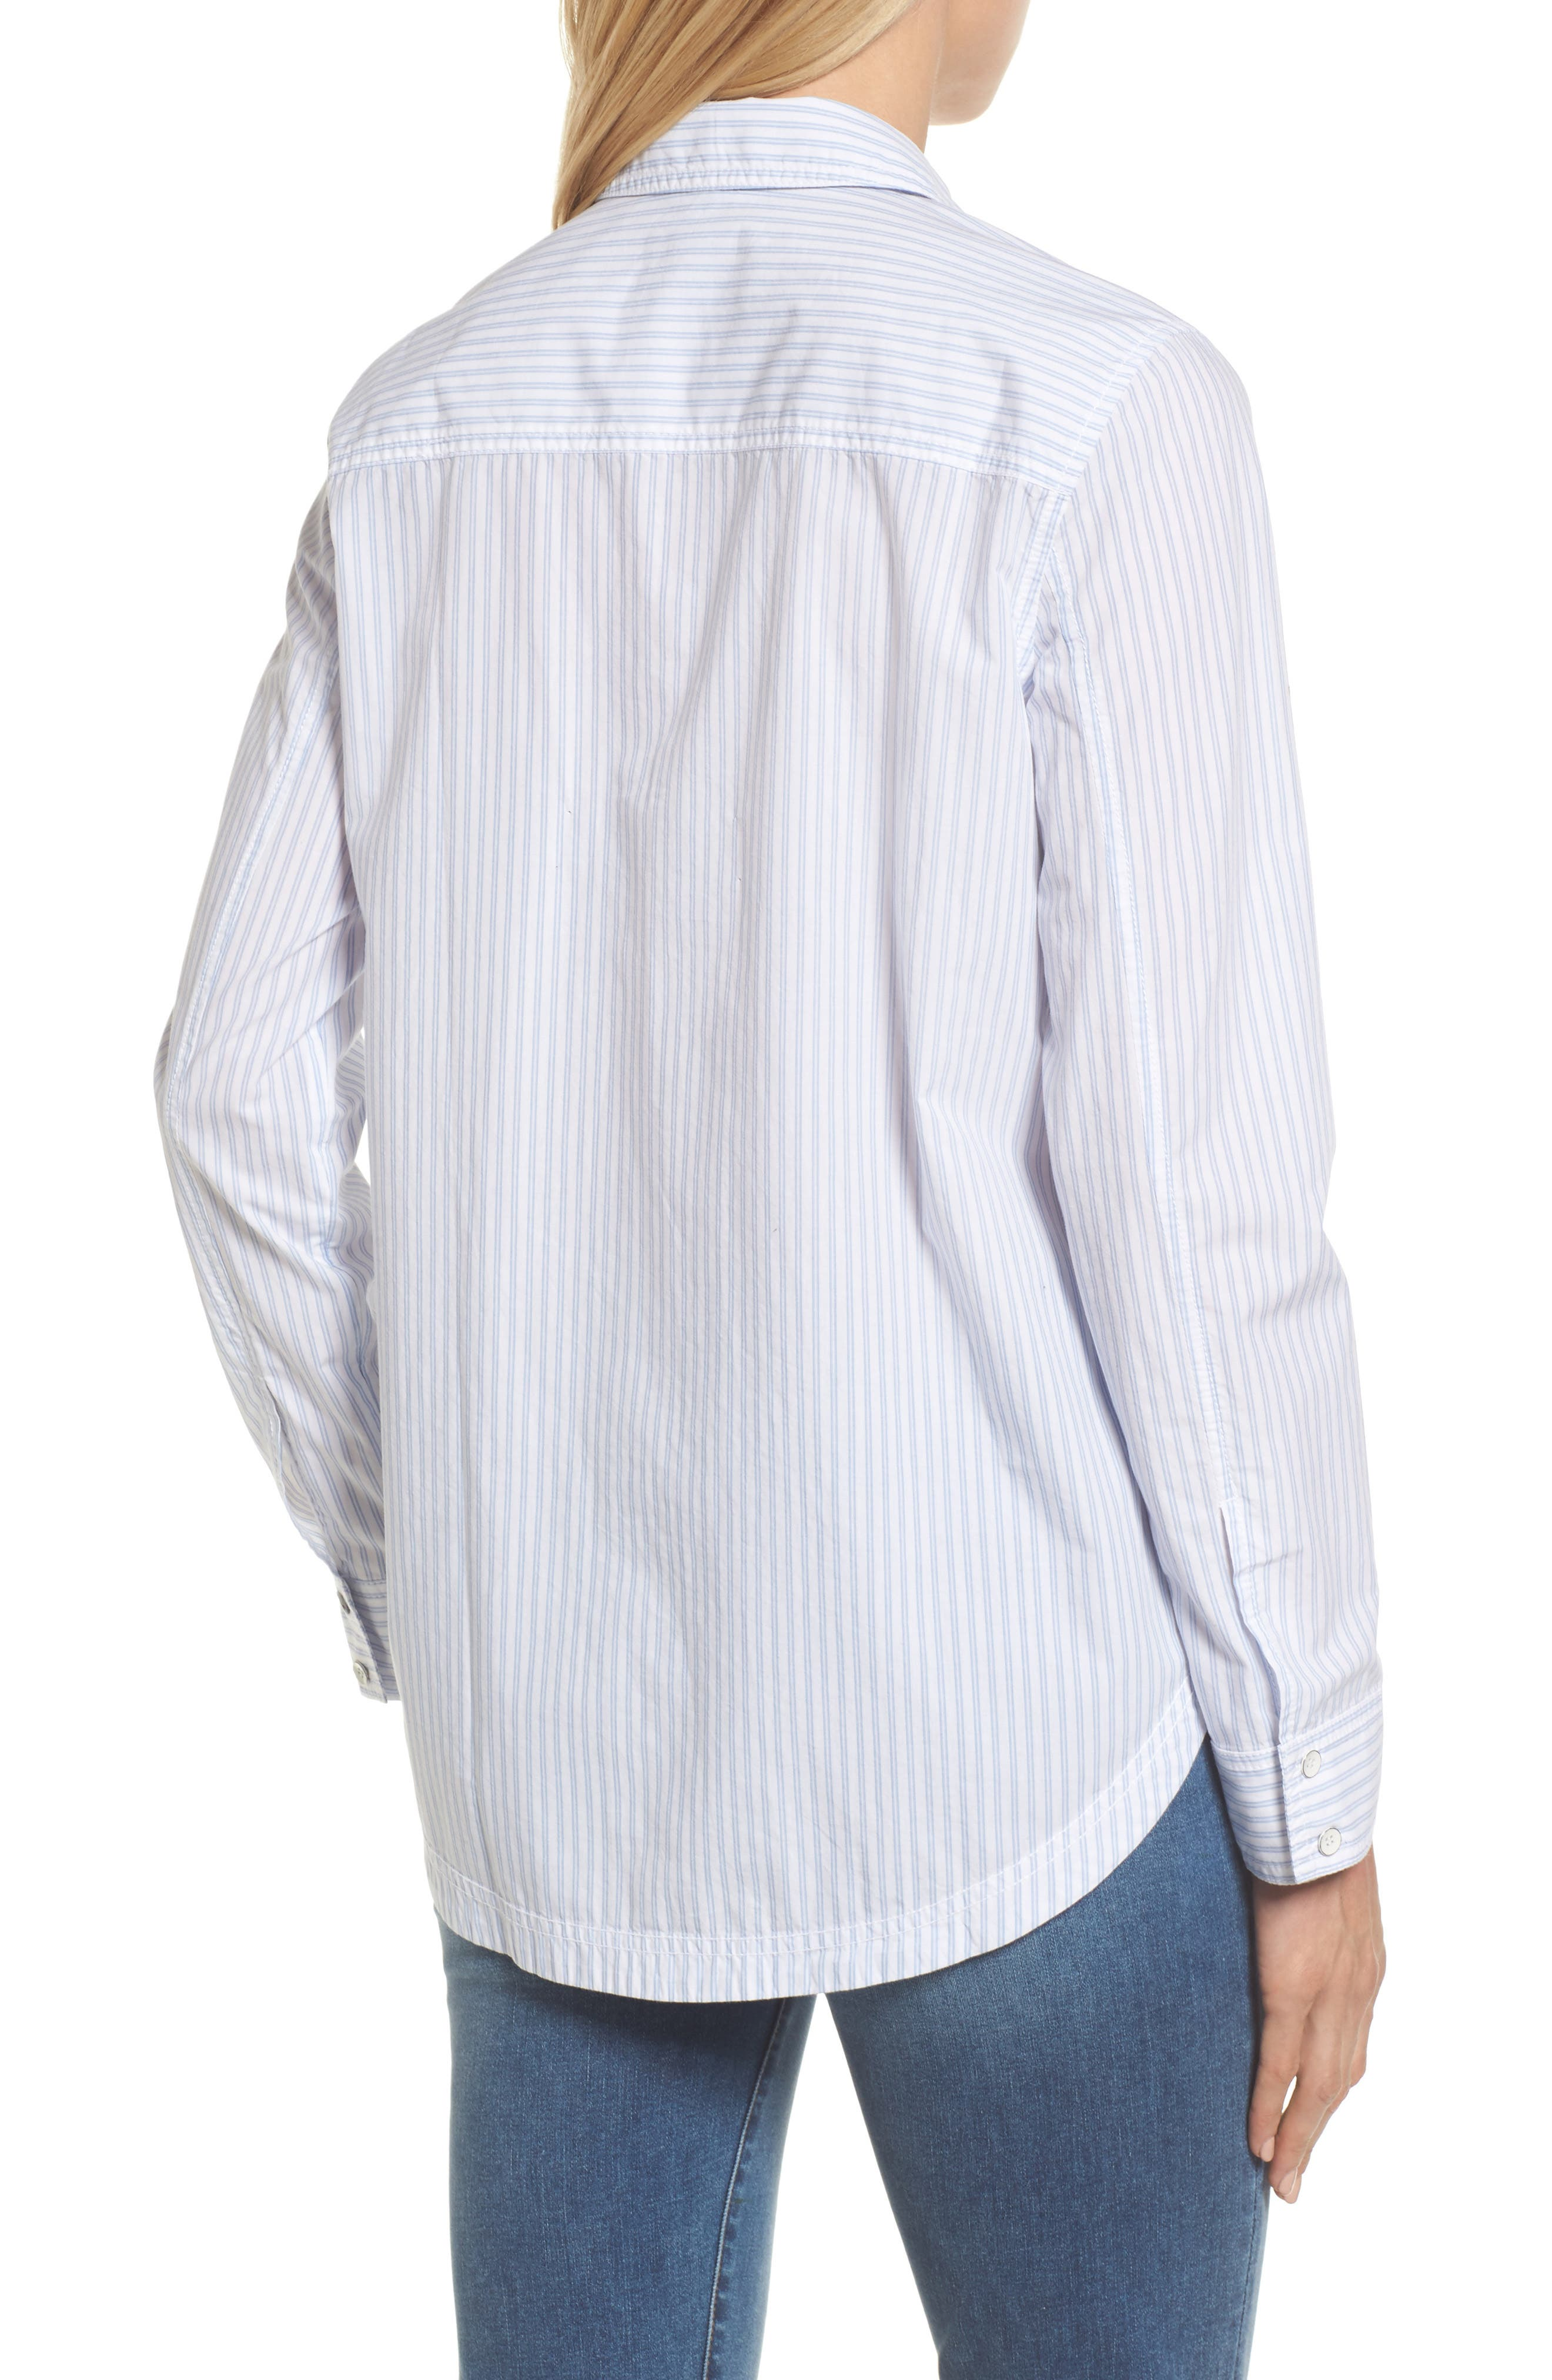 Button Front Pocket Shirt,                             Alternate thumbnail 2, color,                             White- Blue Stripe